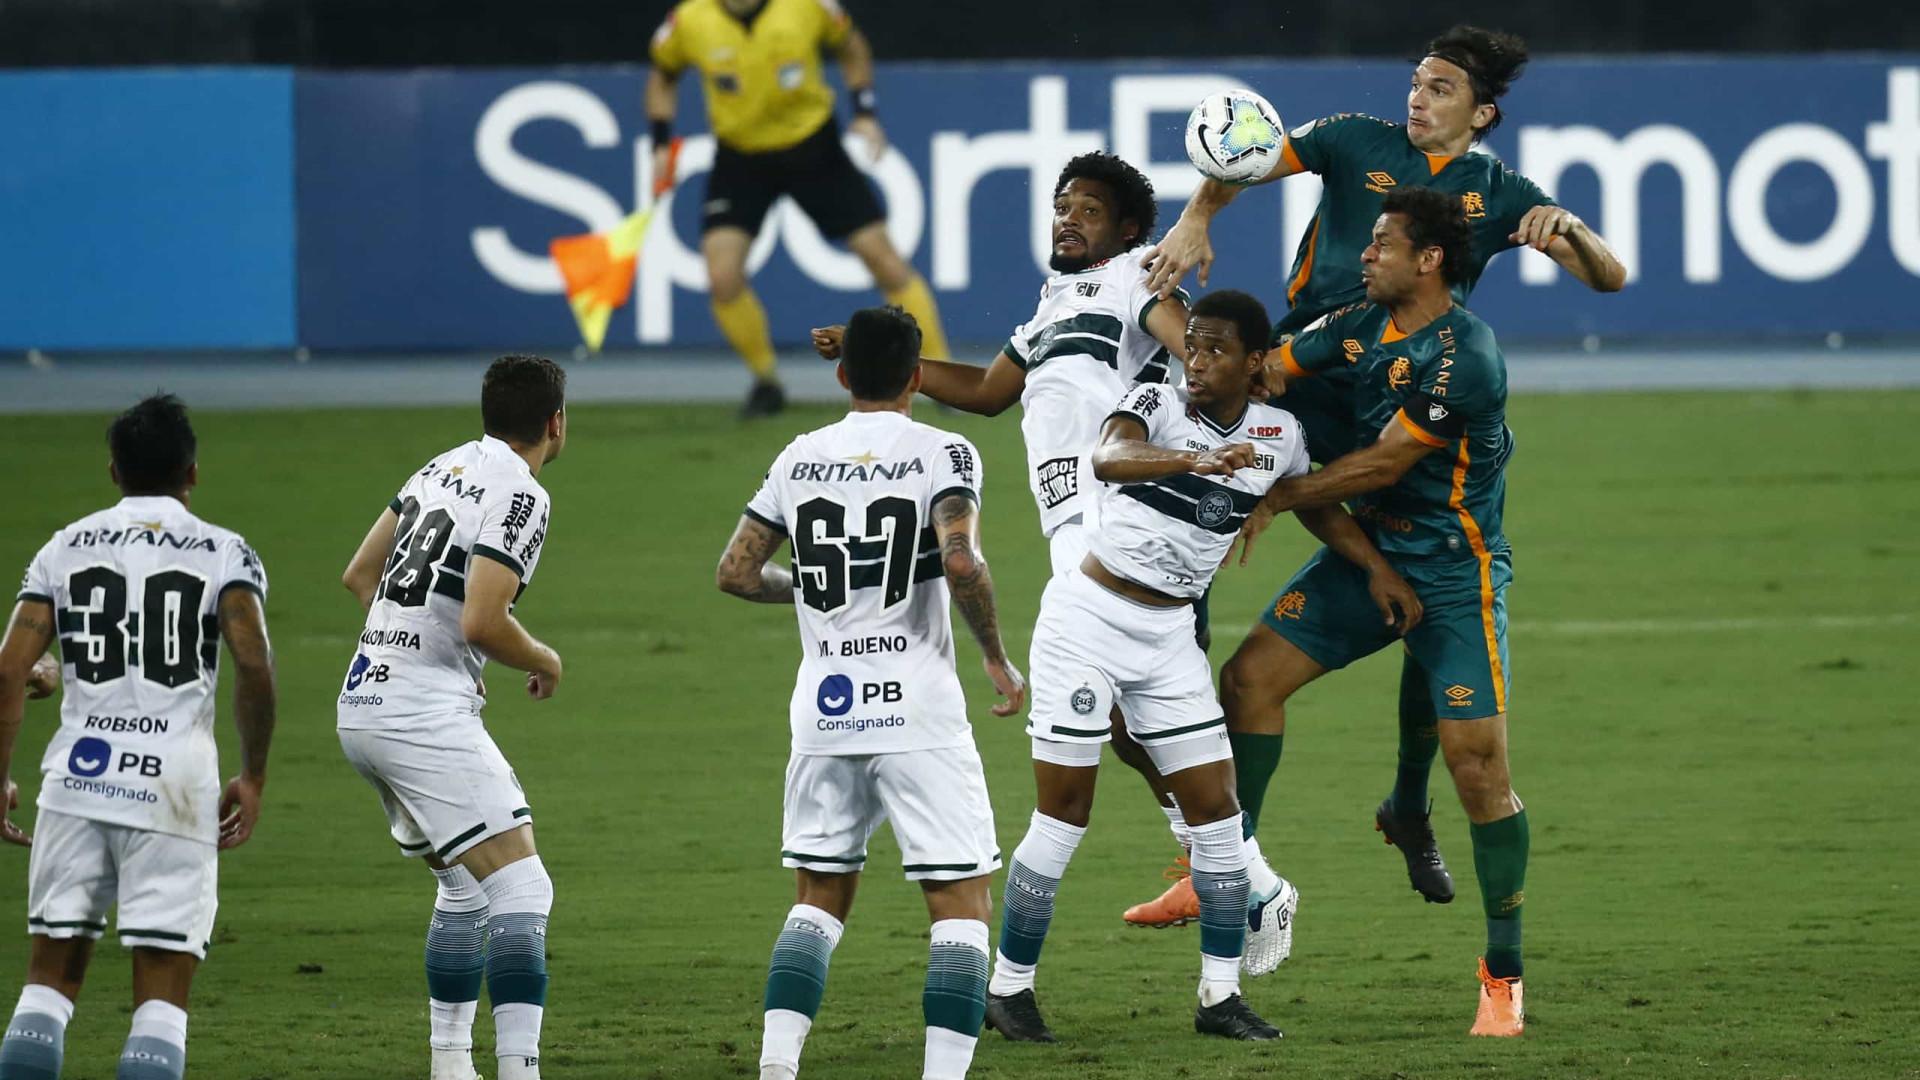 Fluminense goleia Coritiba e alivia pressão